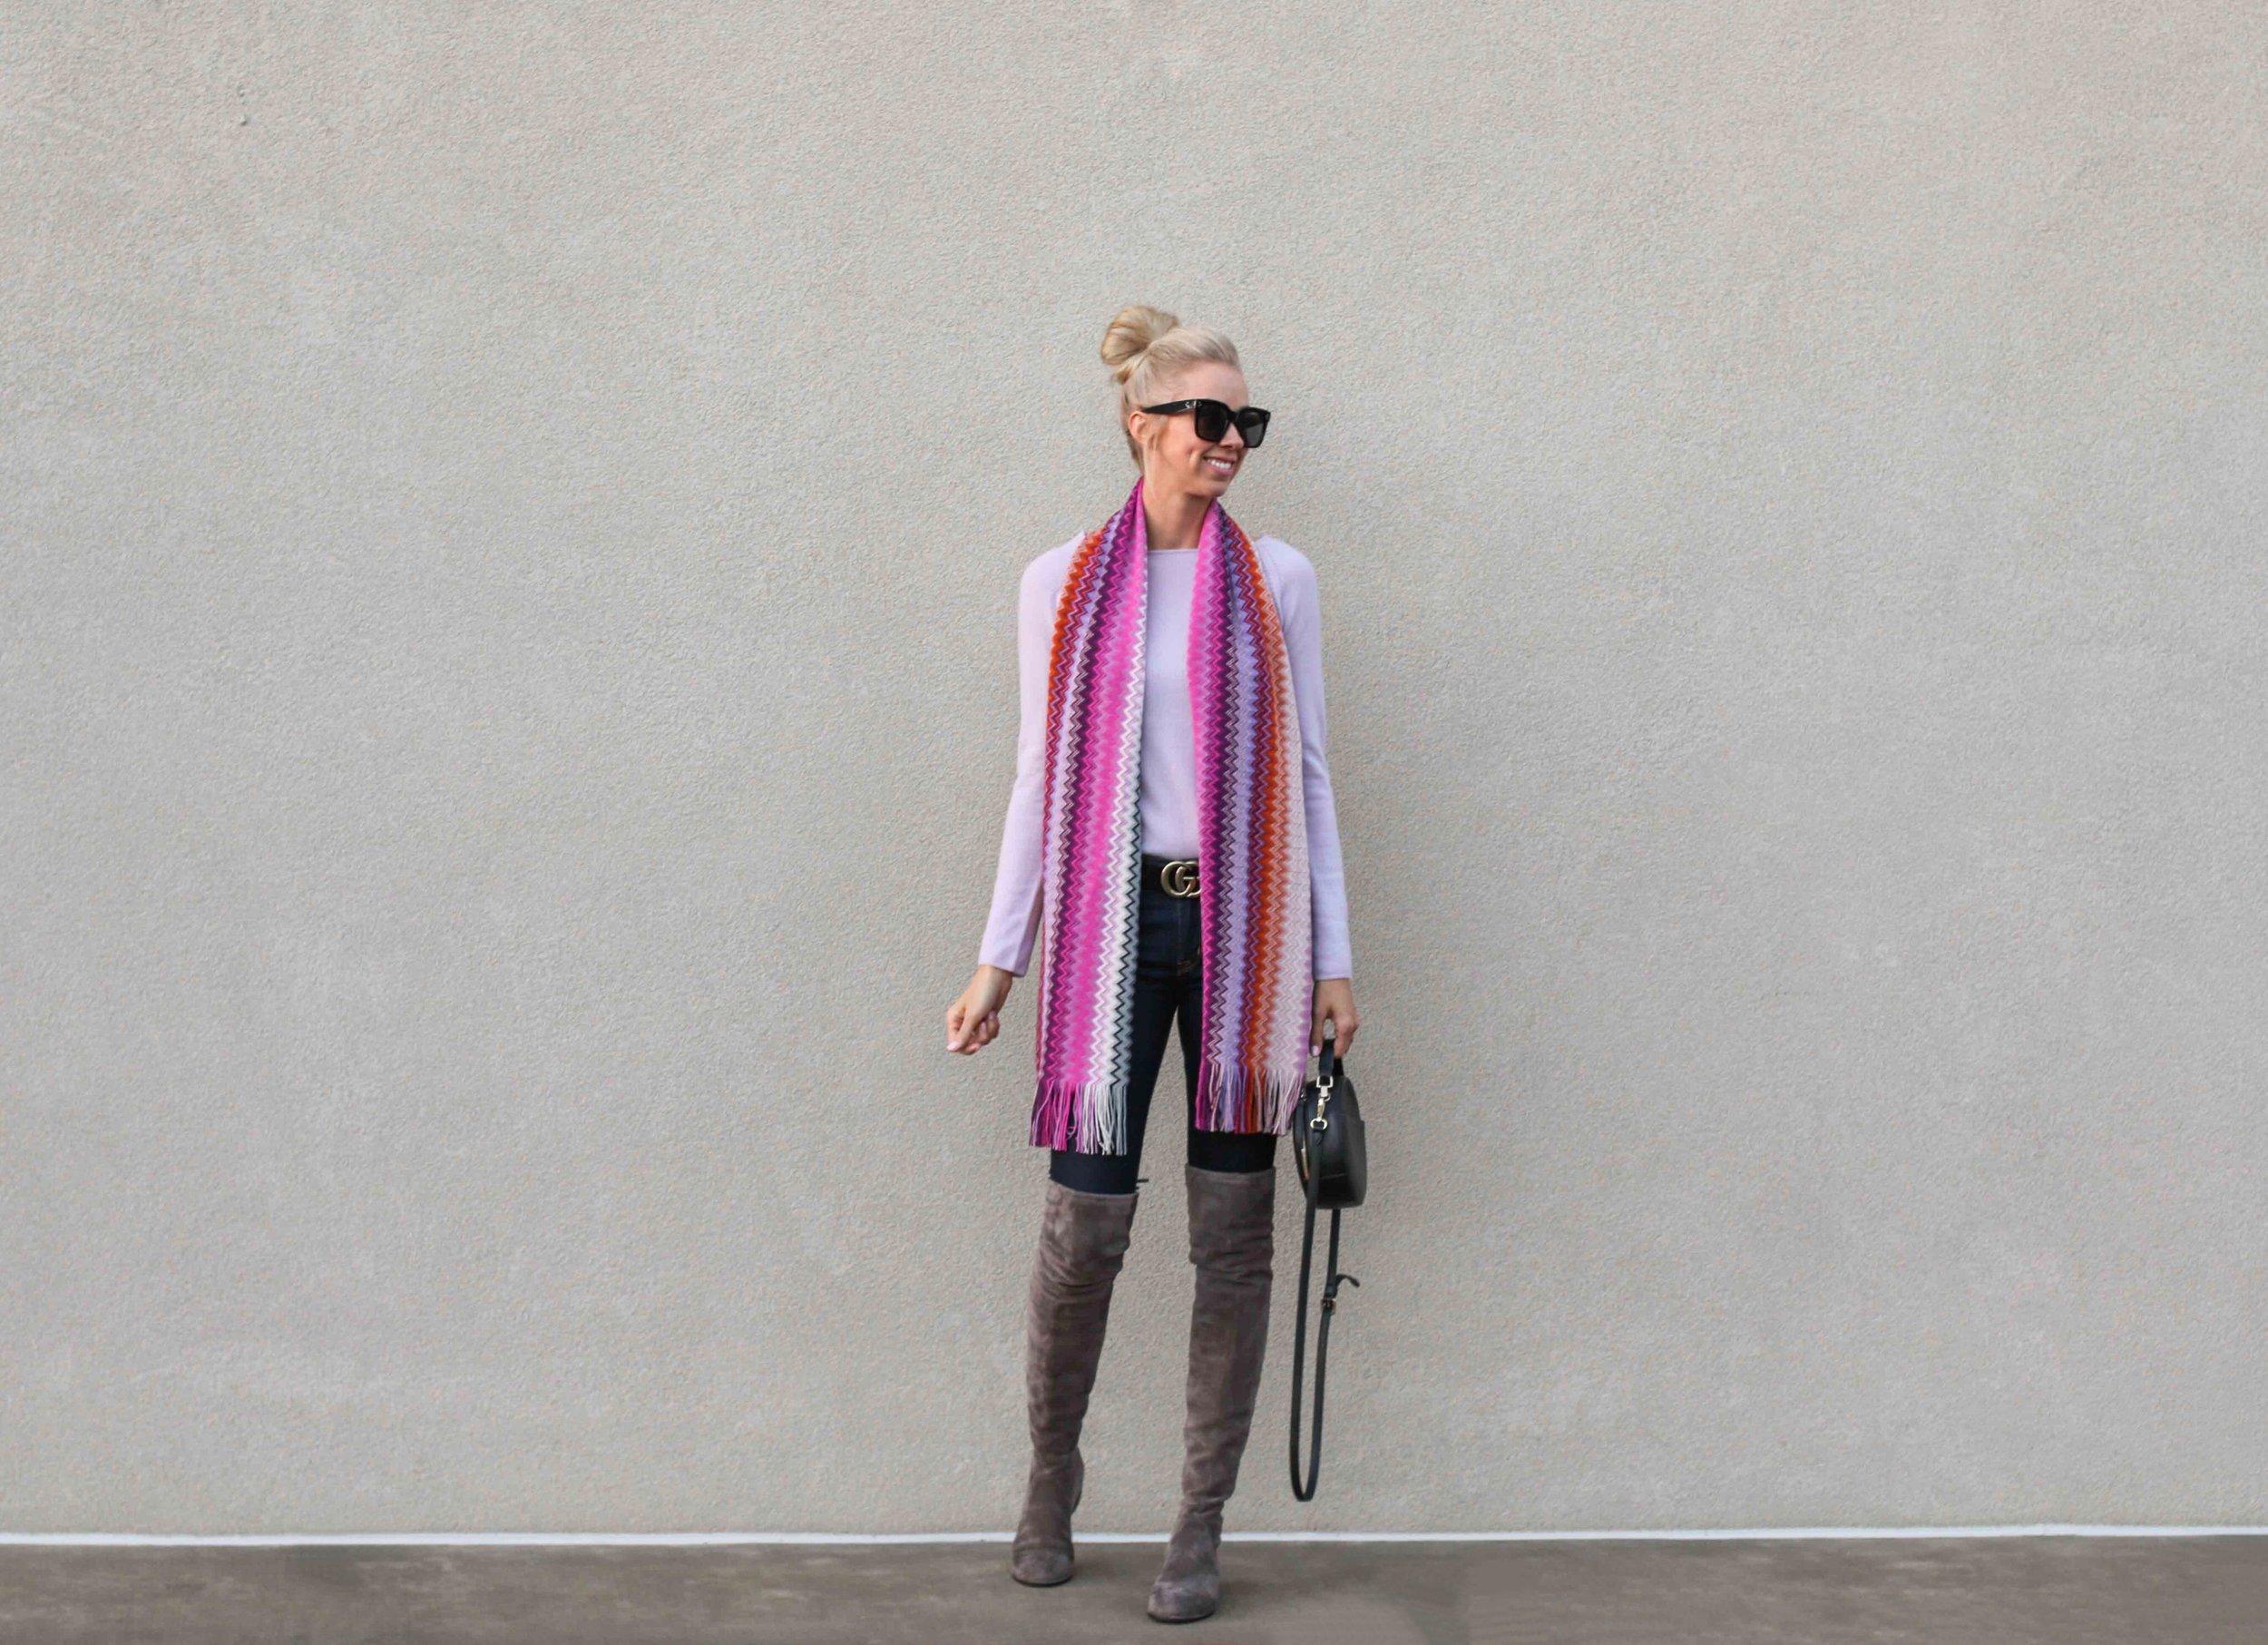 missoni-chevron-scarf-purple-cashmere-sweater-street-style-fashion.jpg